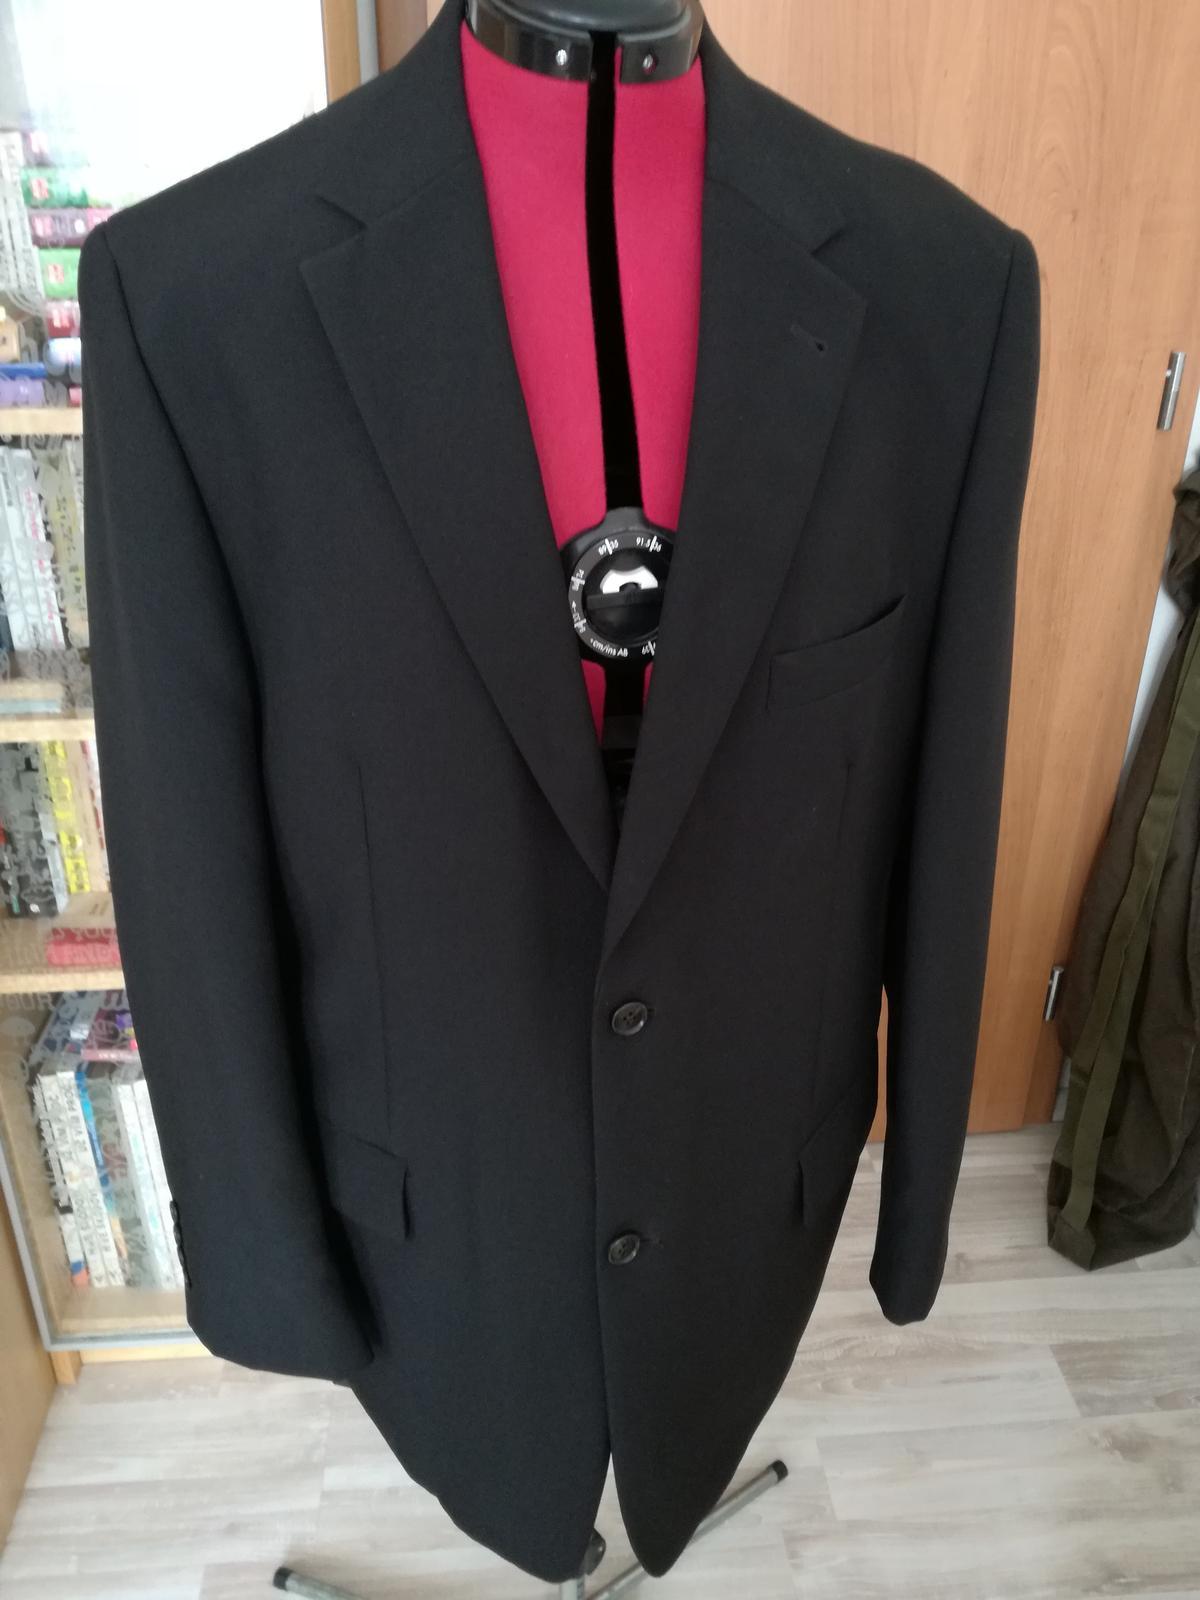 Cerny pansky oblek - Obrázek č. 1